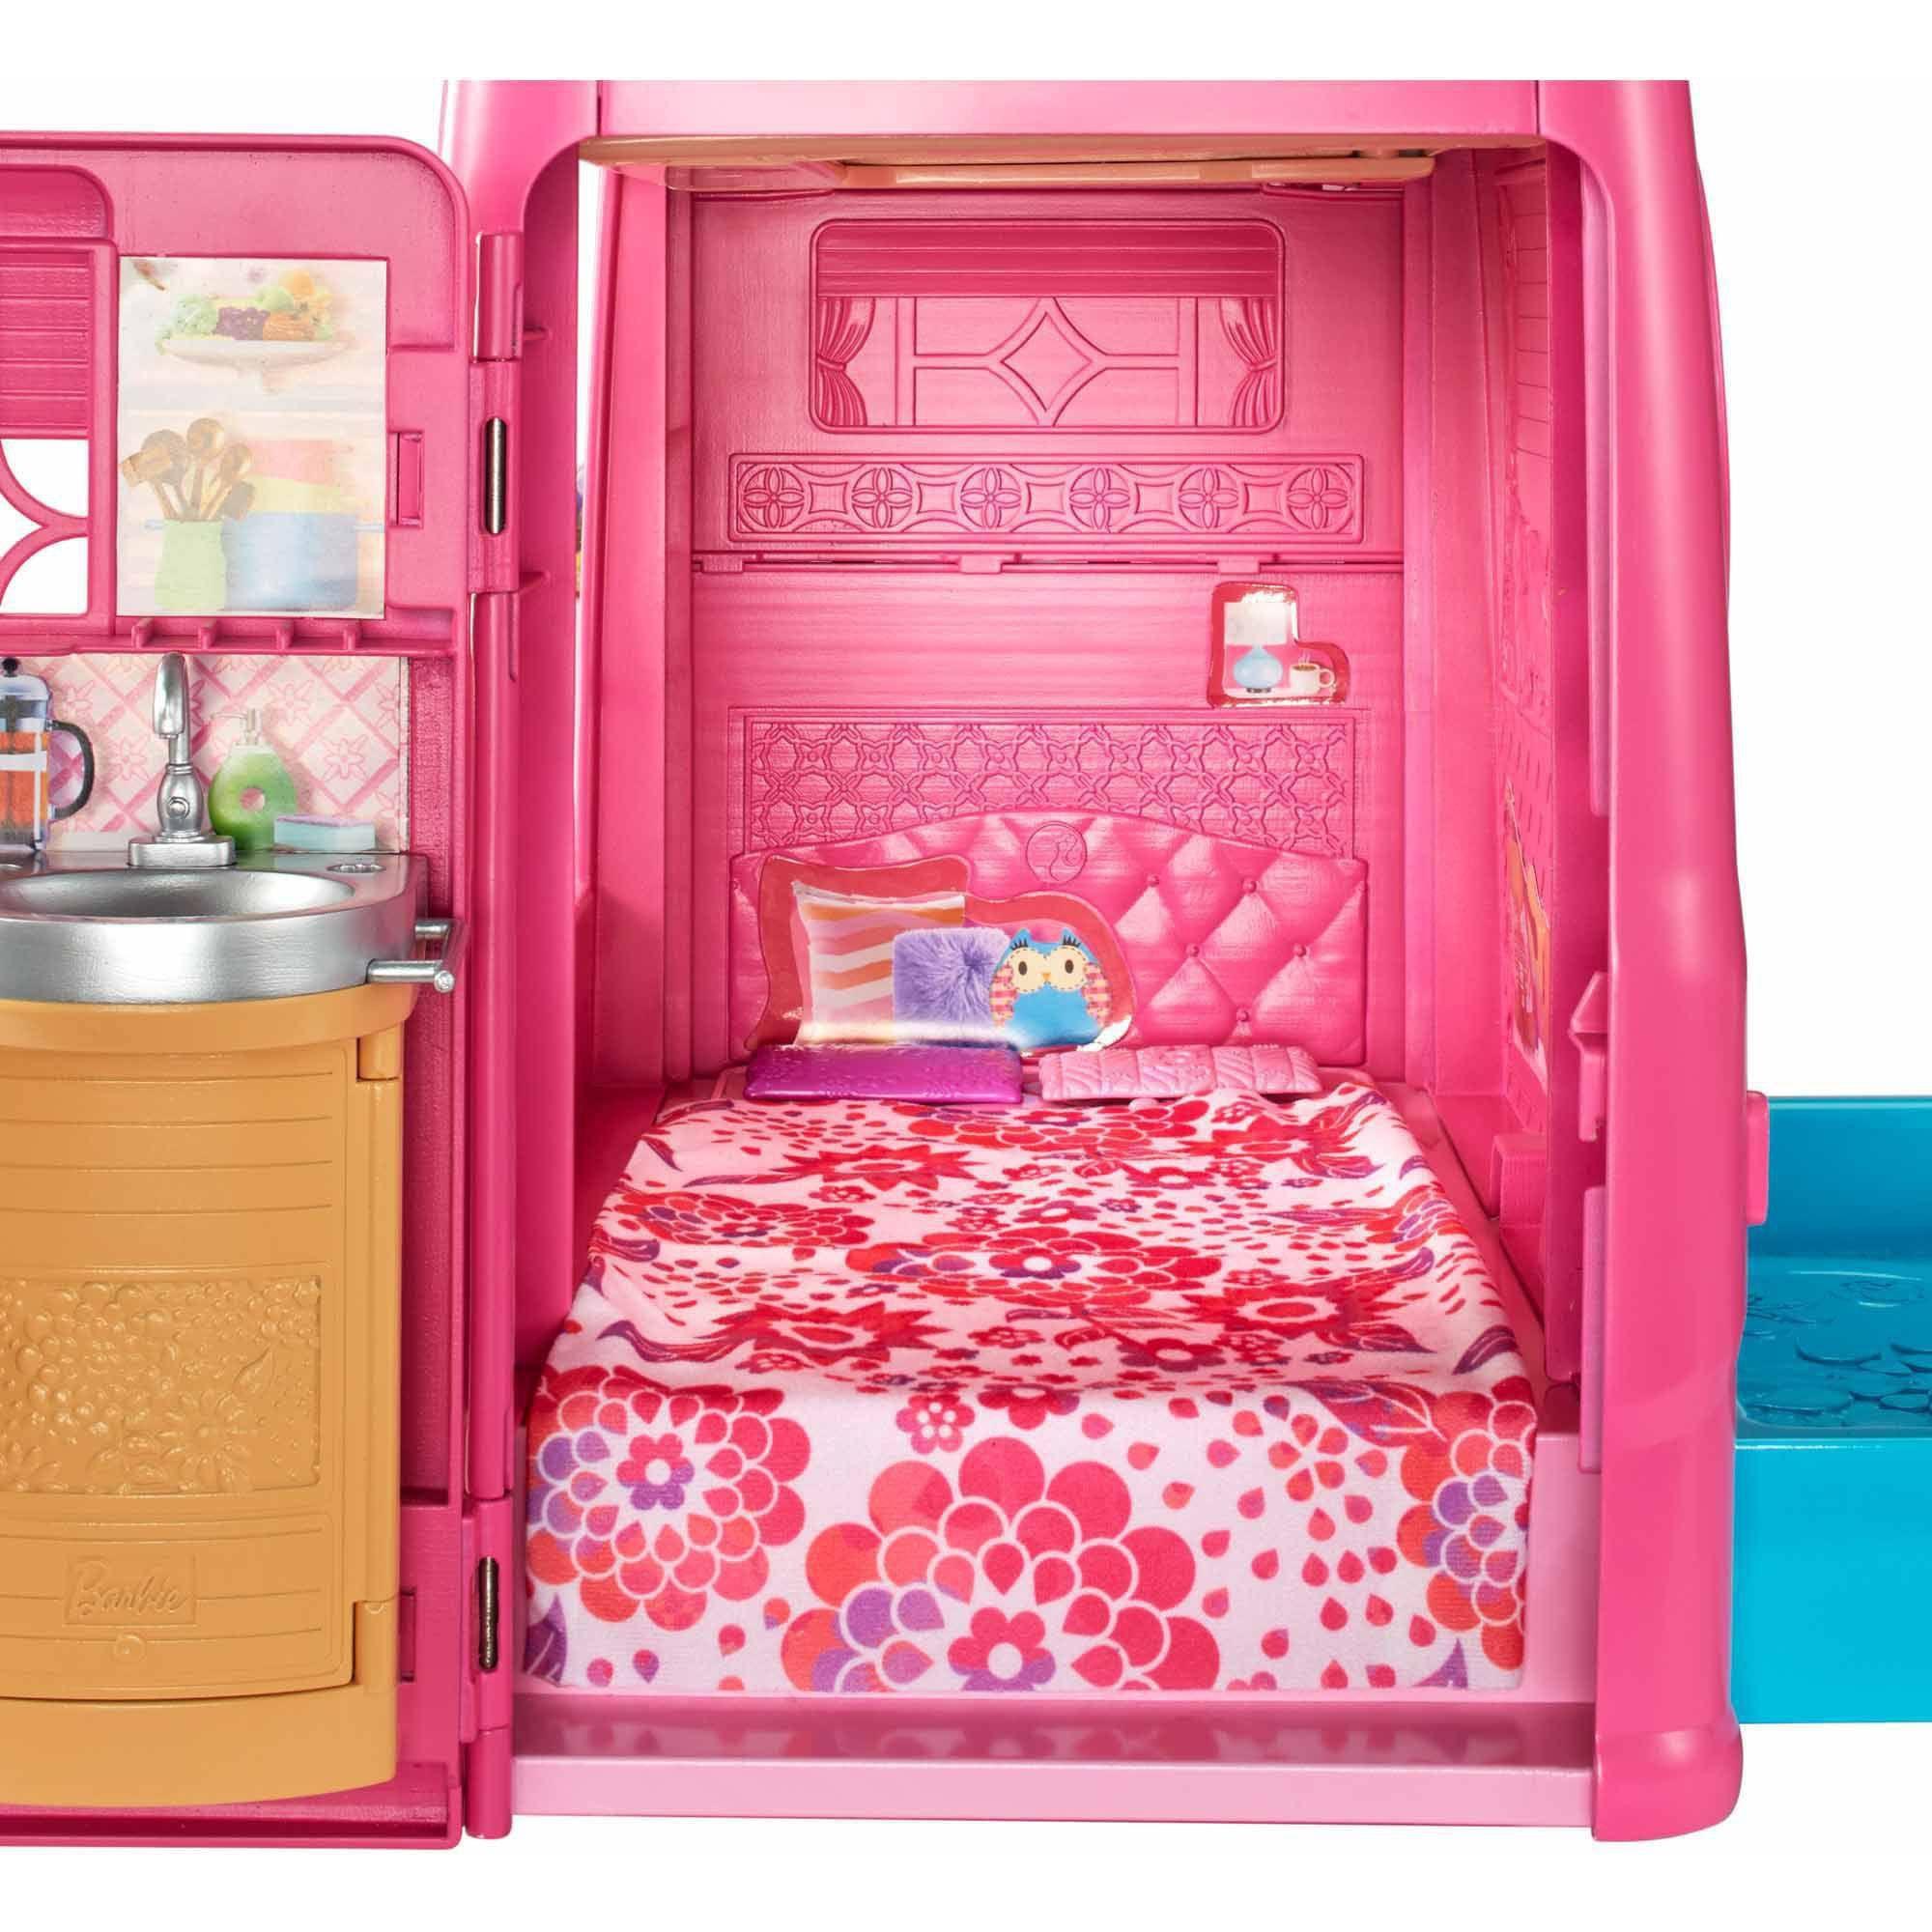 Barbie Pop-Up Camper - Walmart.com | Barbie stuff that I like ...